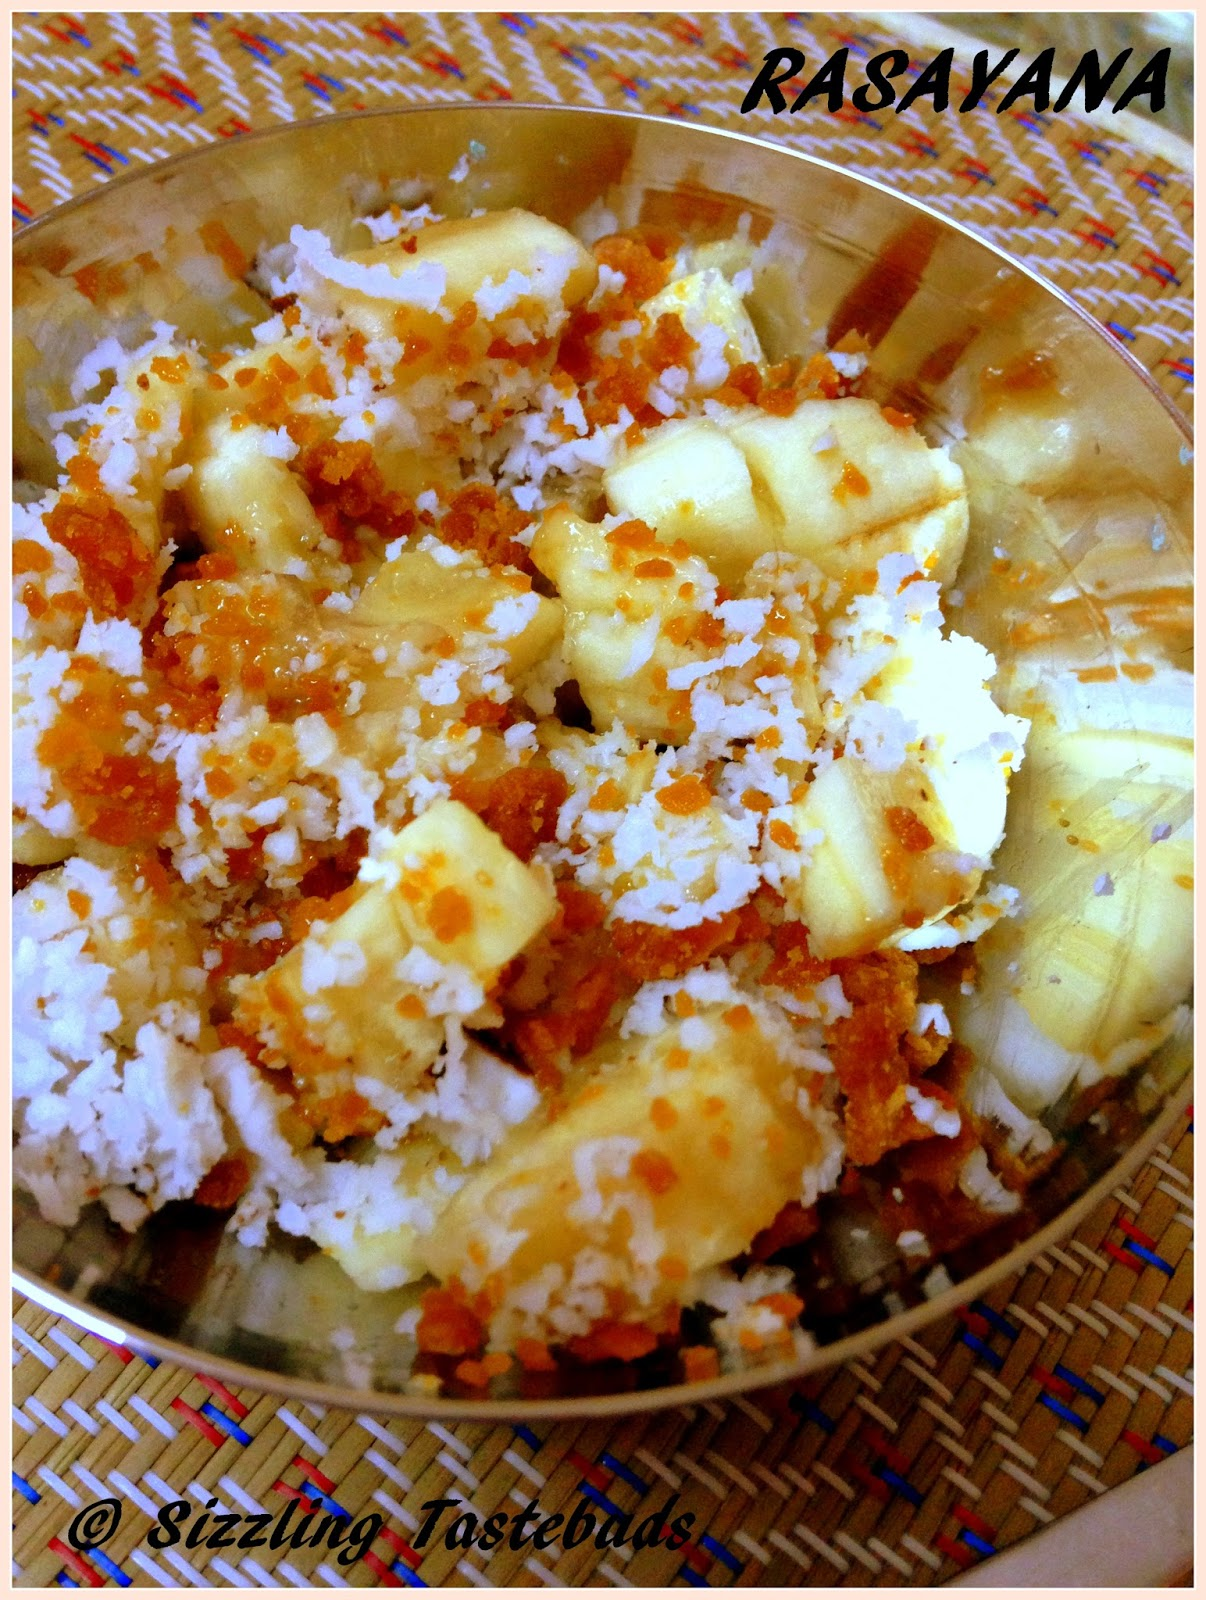 Sizzling tastebuds rasayana rama navami recipe forumfinder Gallery